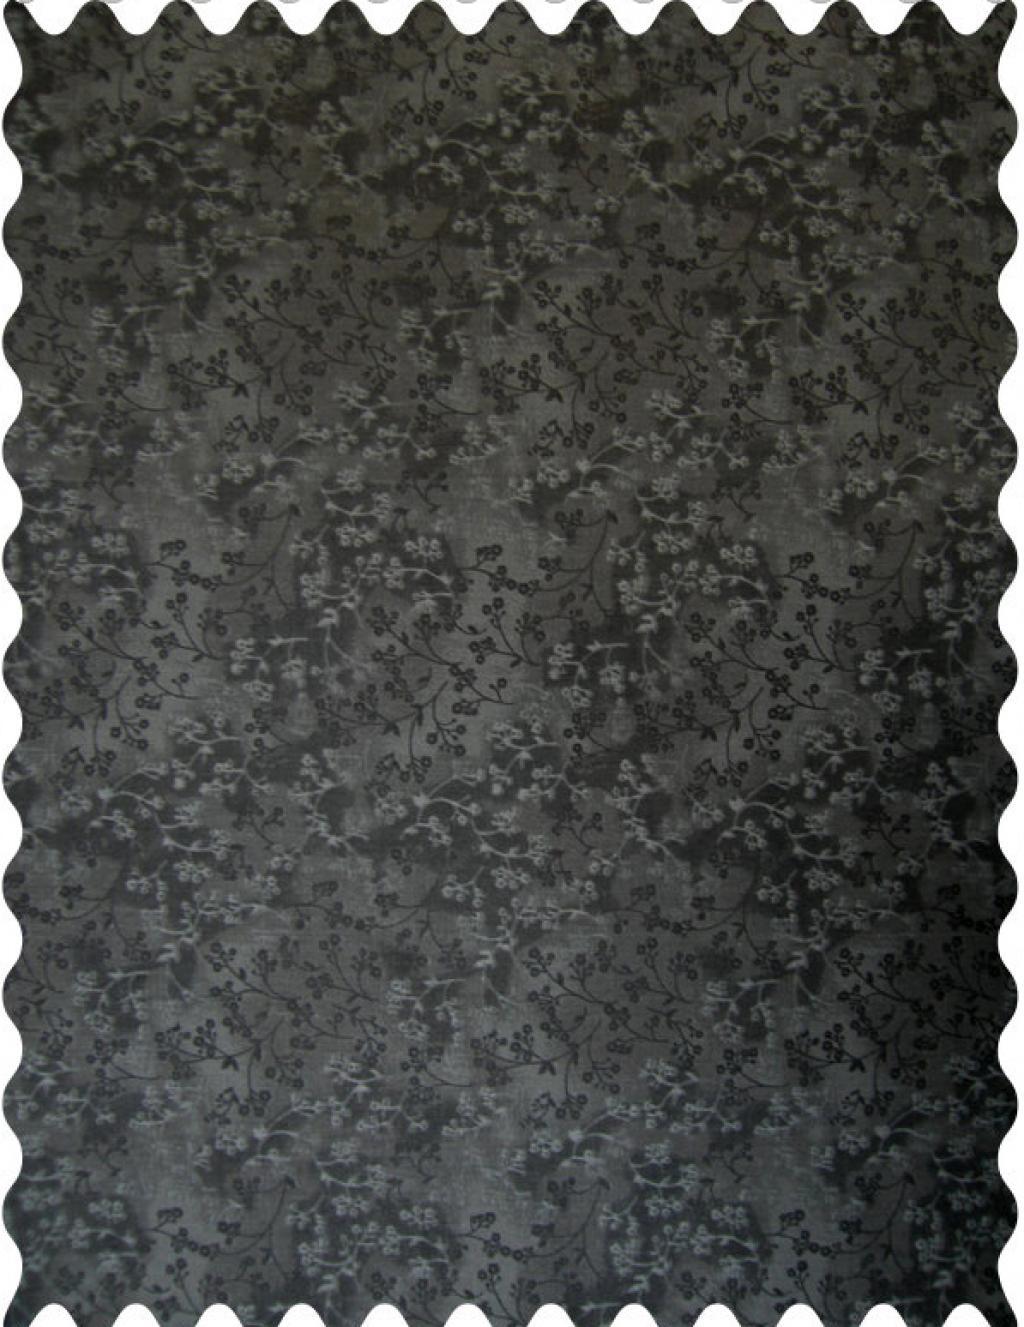 Charcoal Grey Floral Fabric Fabric Shop Sheets Sheetworld